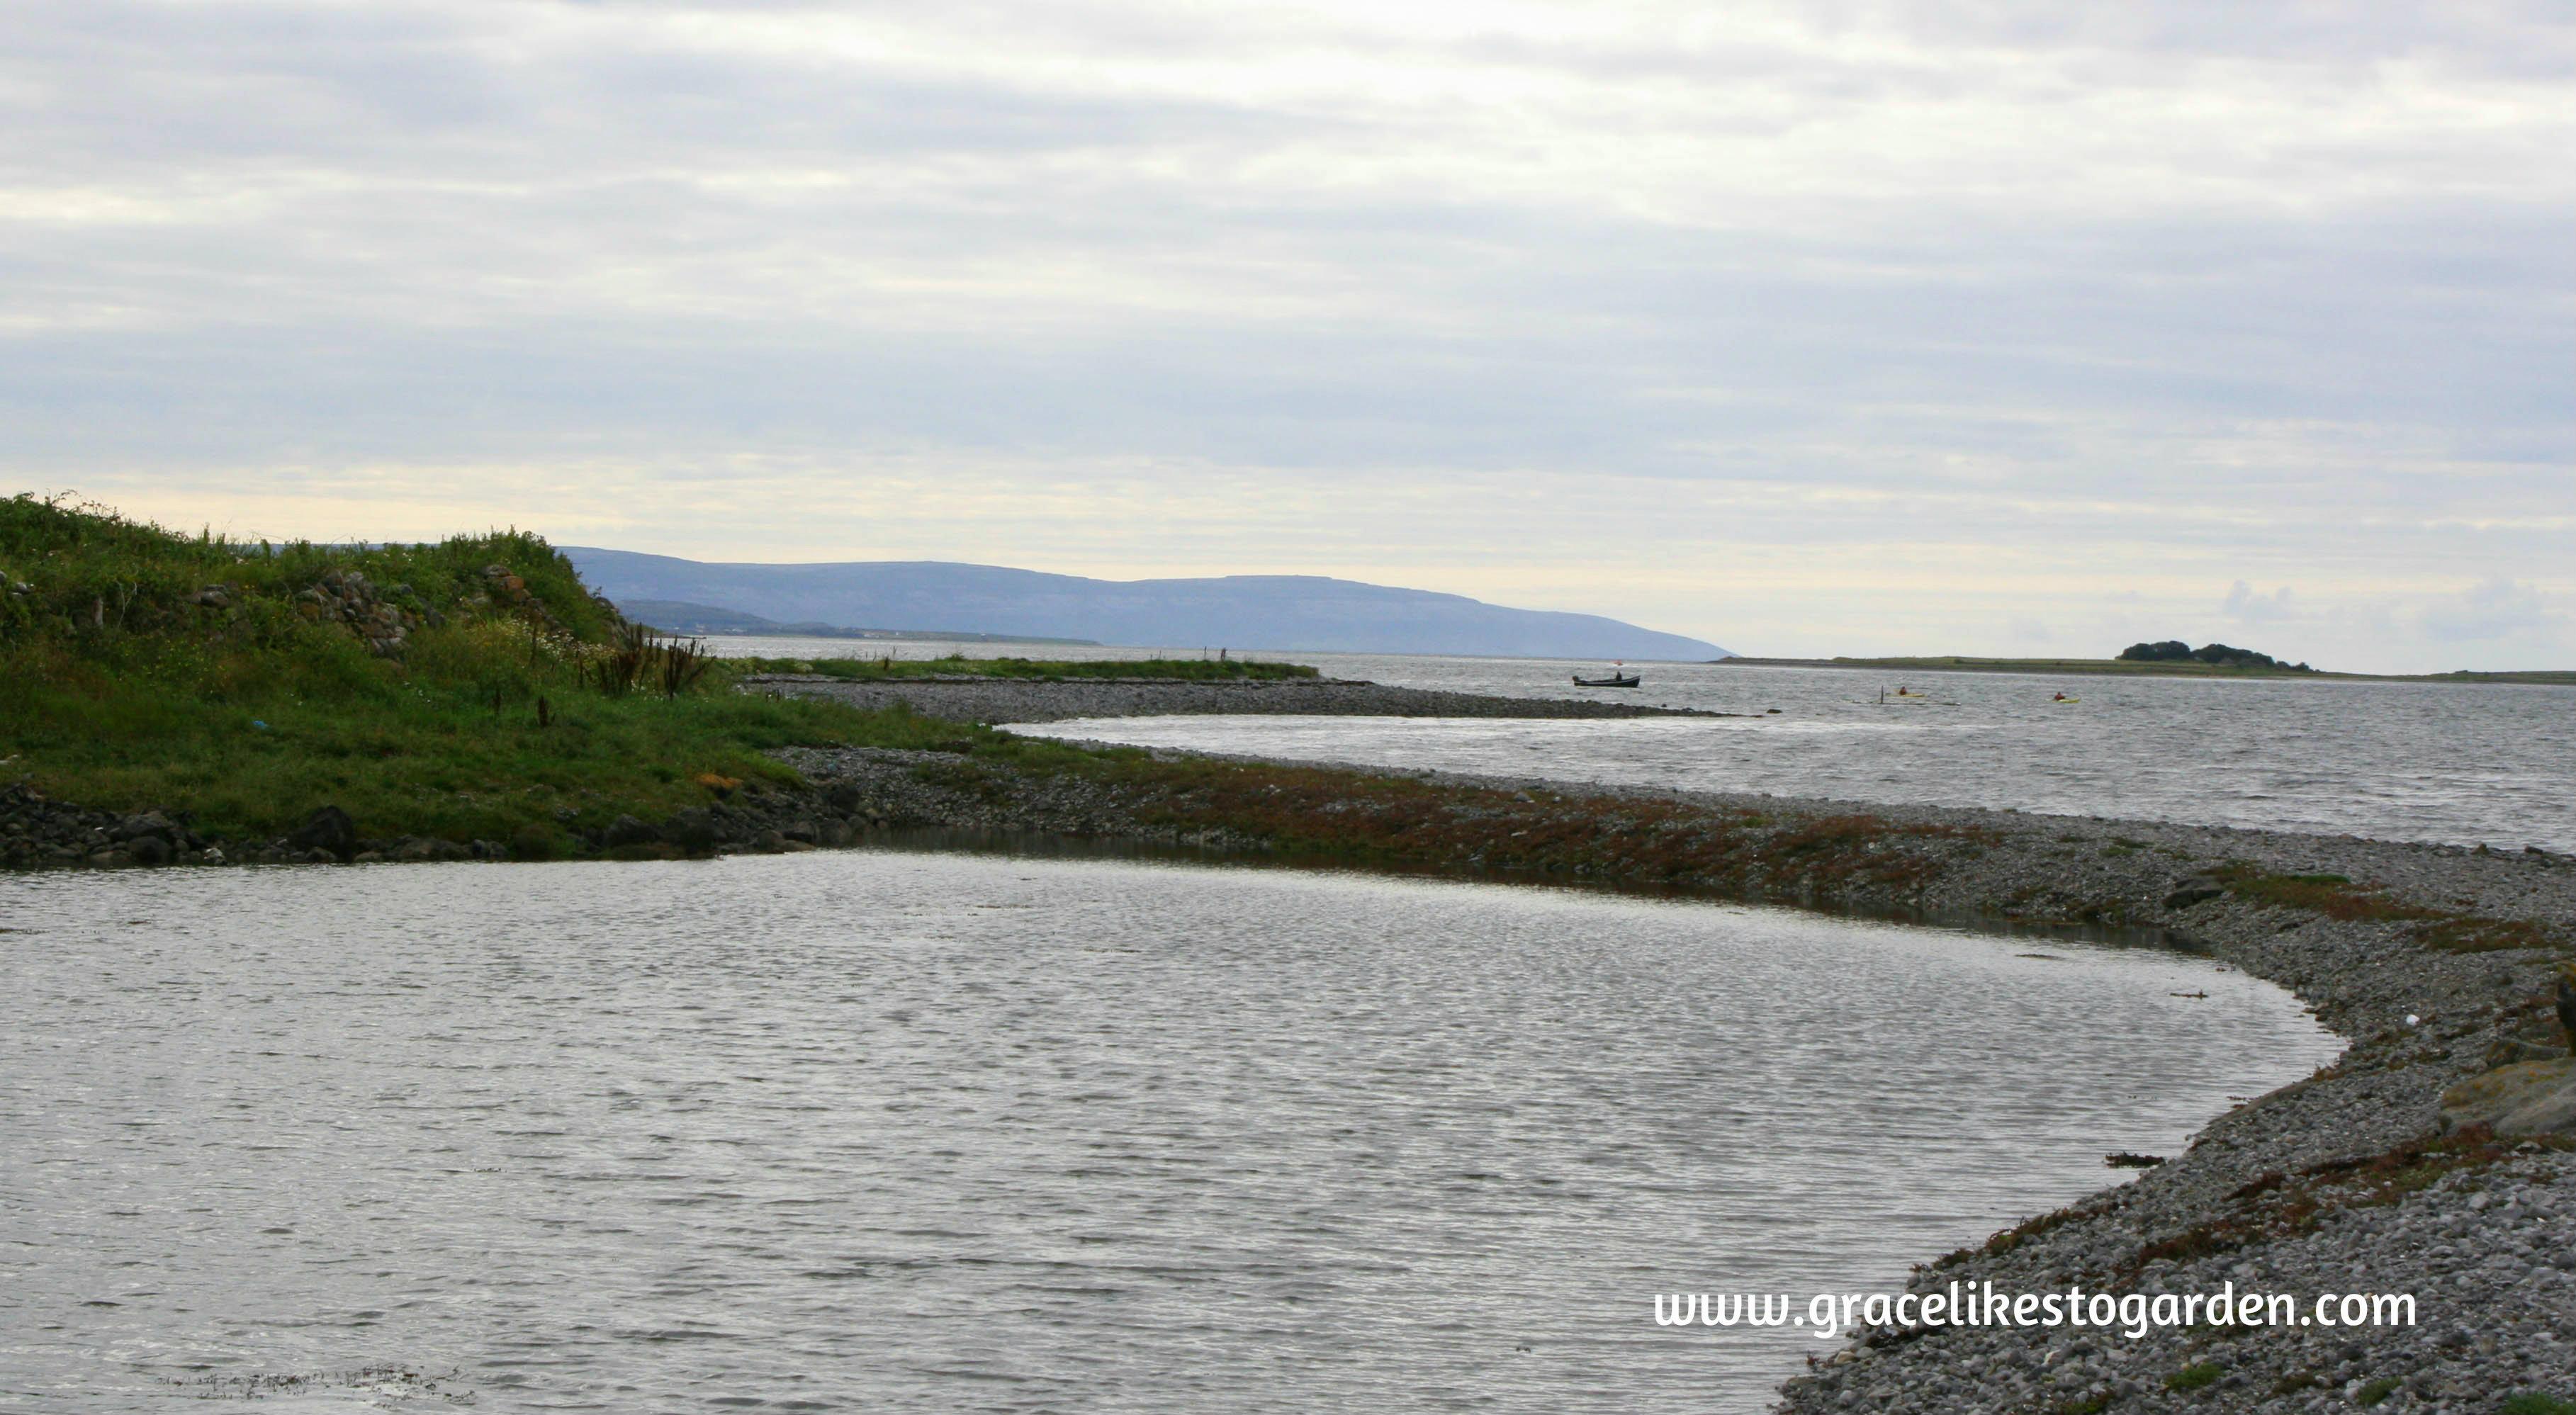 wild teasel visiting island eddy on wild atlantic way